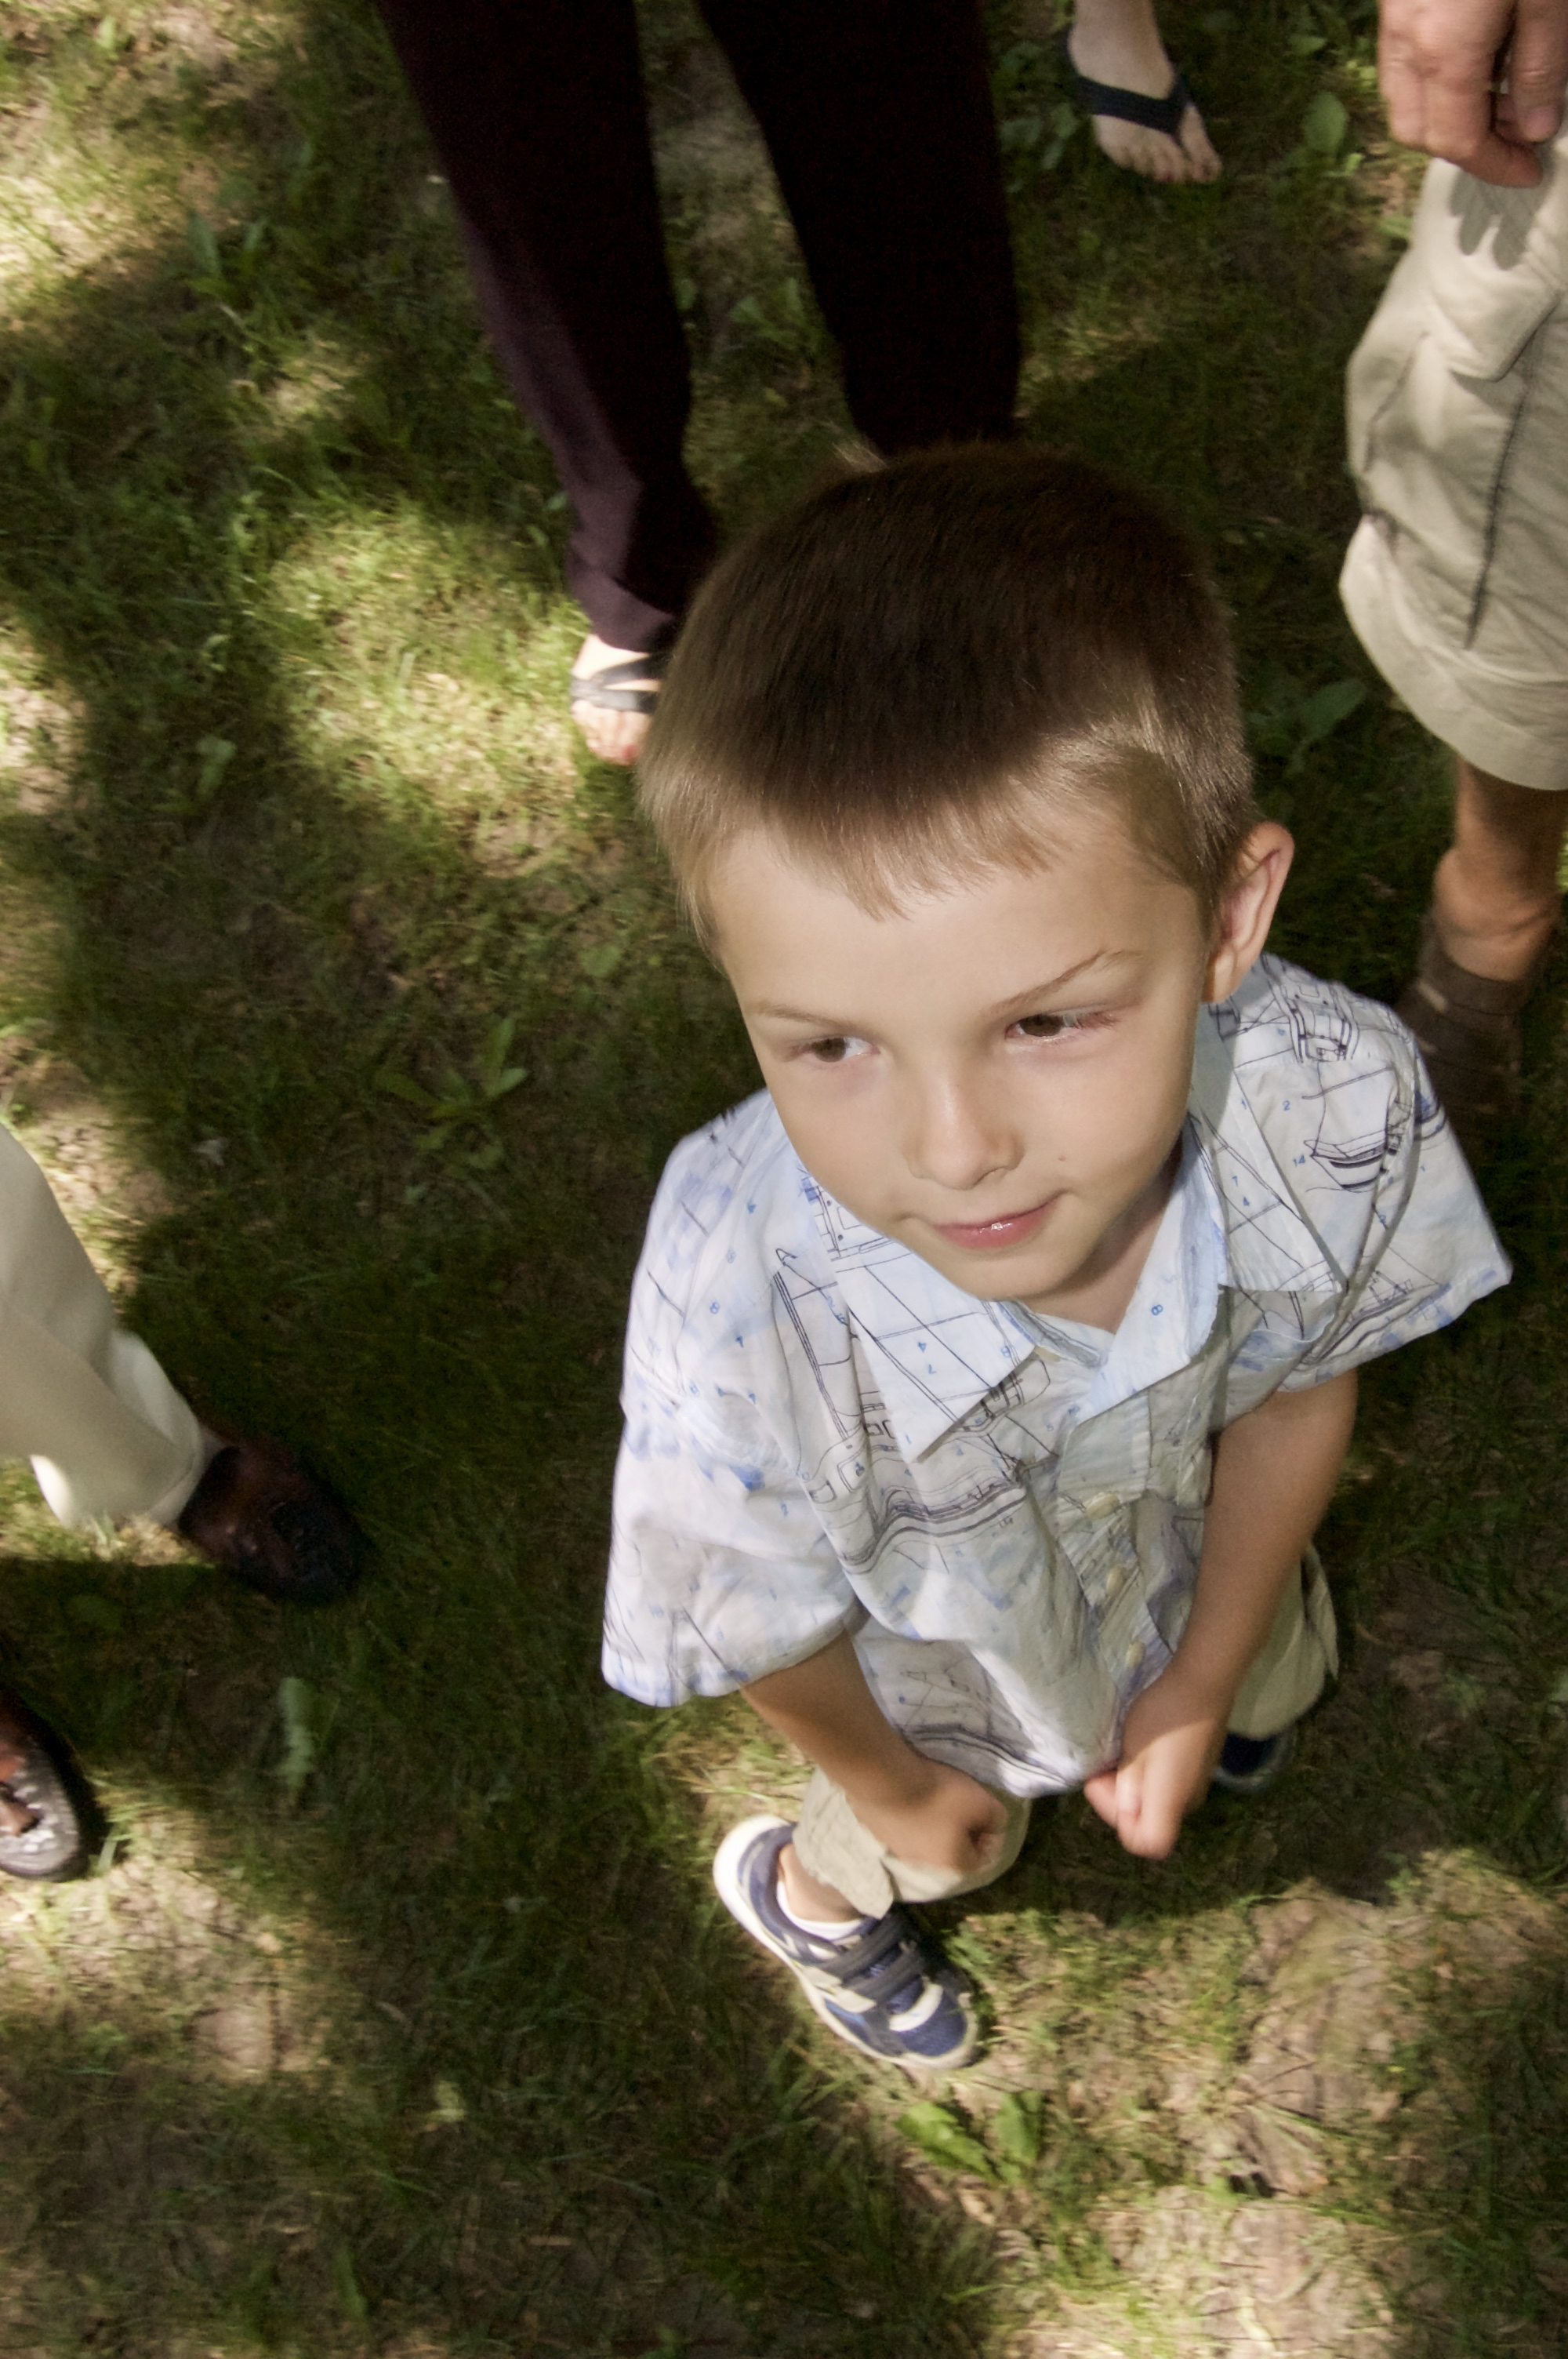 Surrounded. Westmorland Park. Madison, Wisconsin. June 2009. © William D. Walker